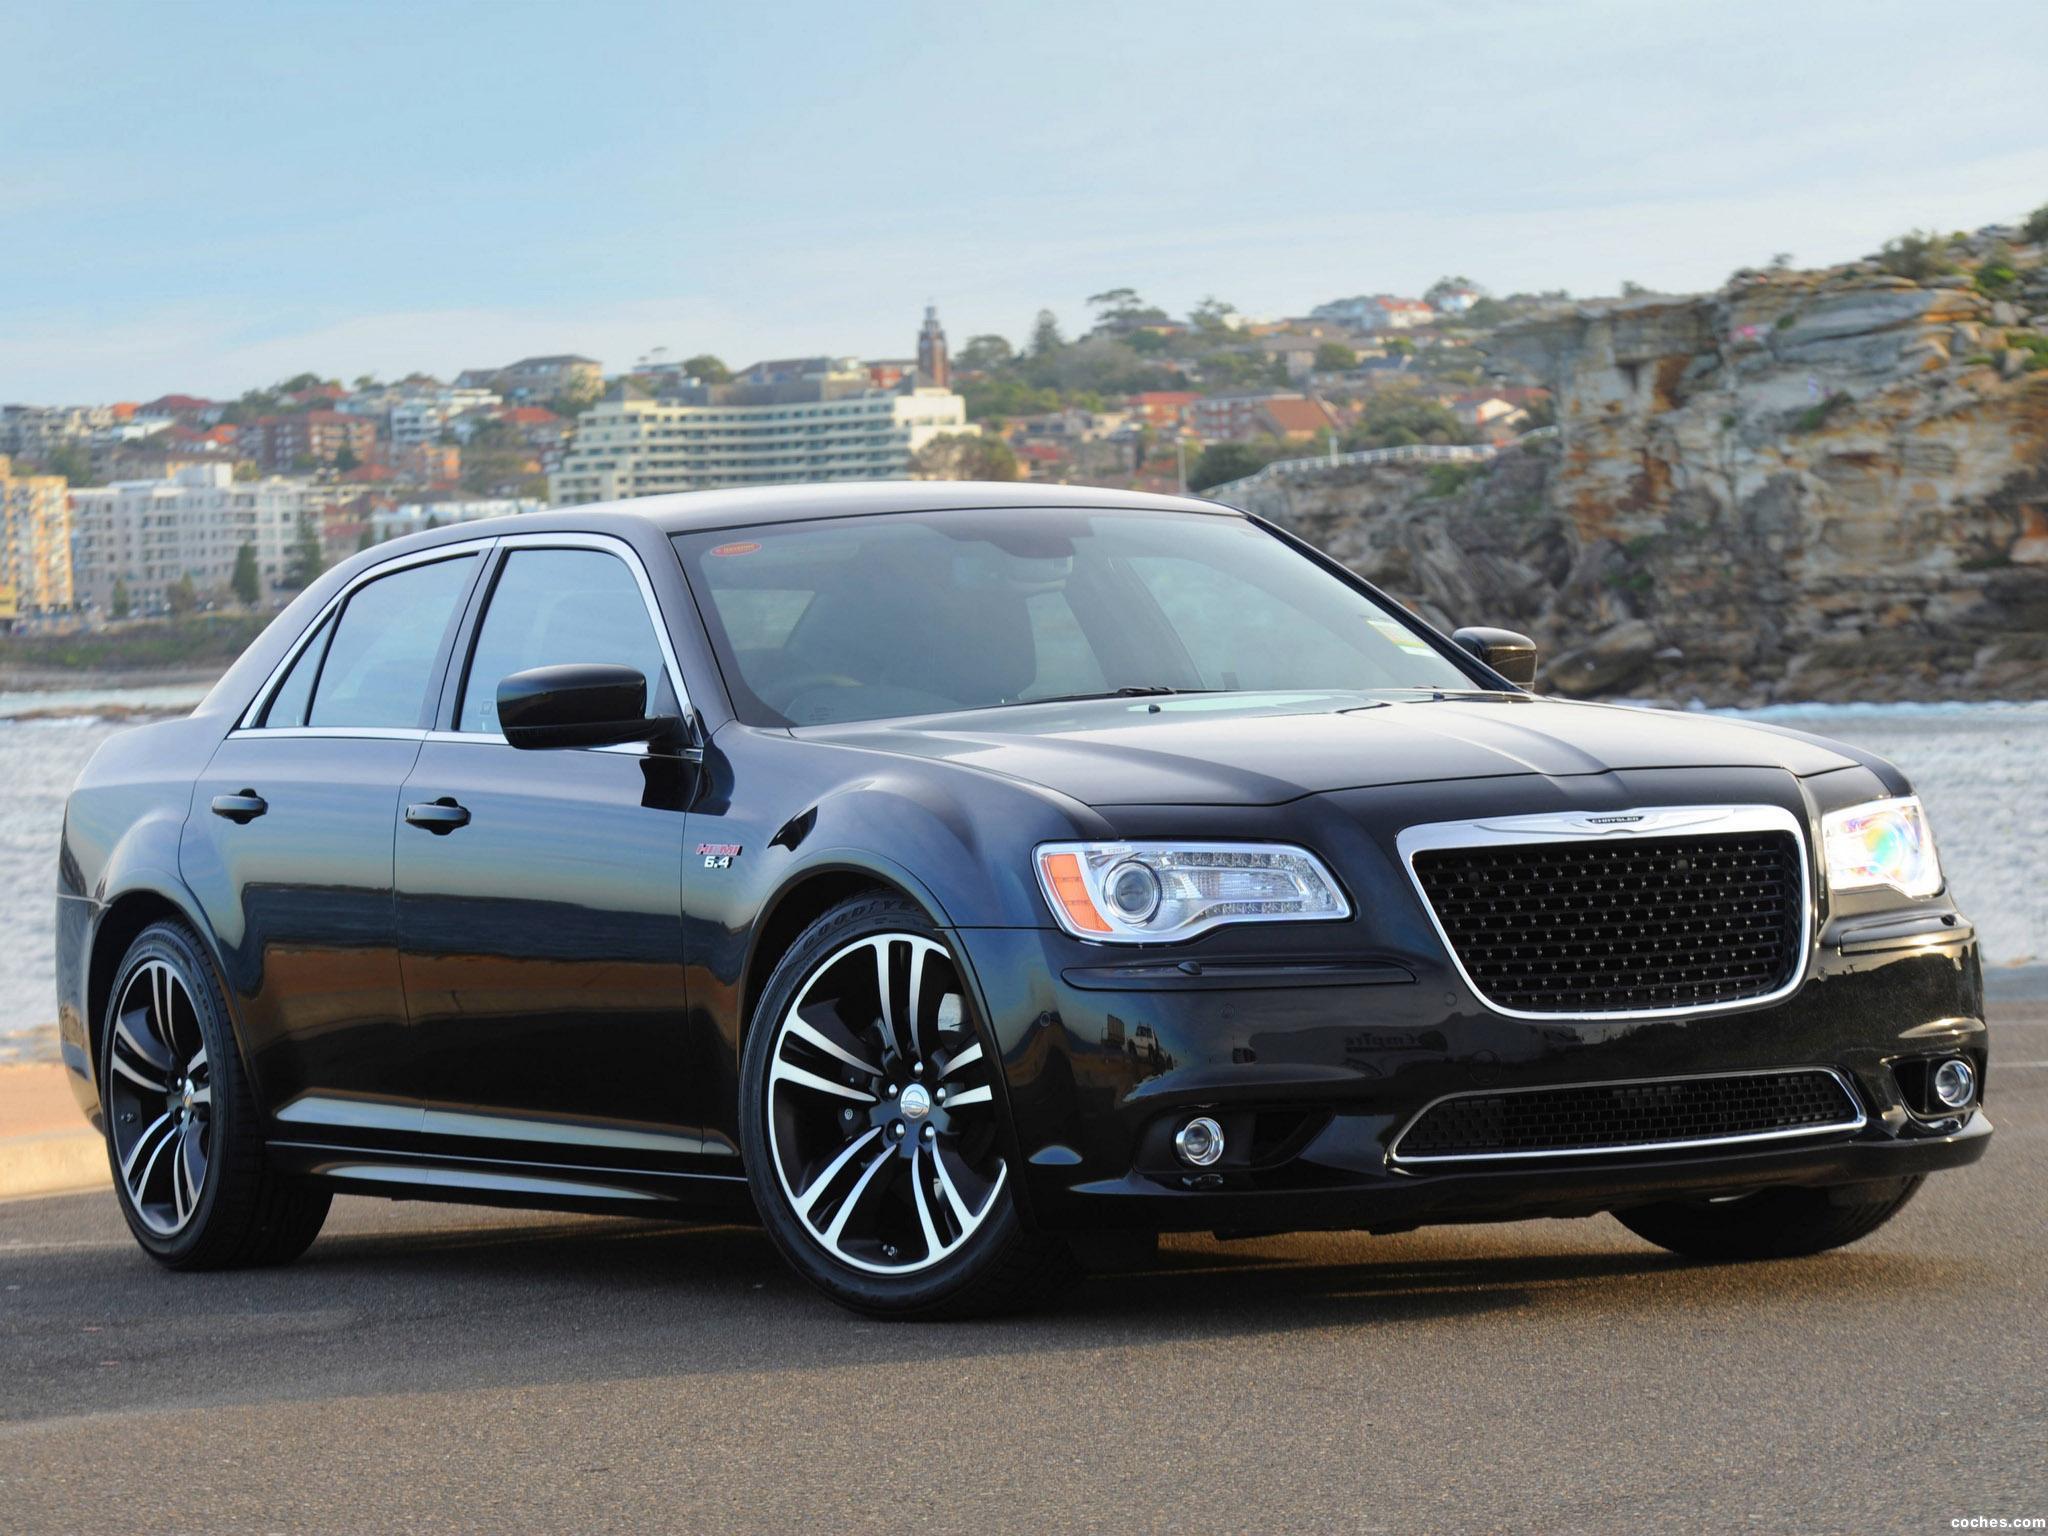 2013 chrysler 300 300 c luxury s srt8 sedan hemi chrysler autos post. Cars Review. Best American Auto & Cars Review